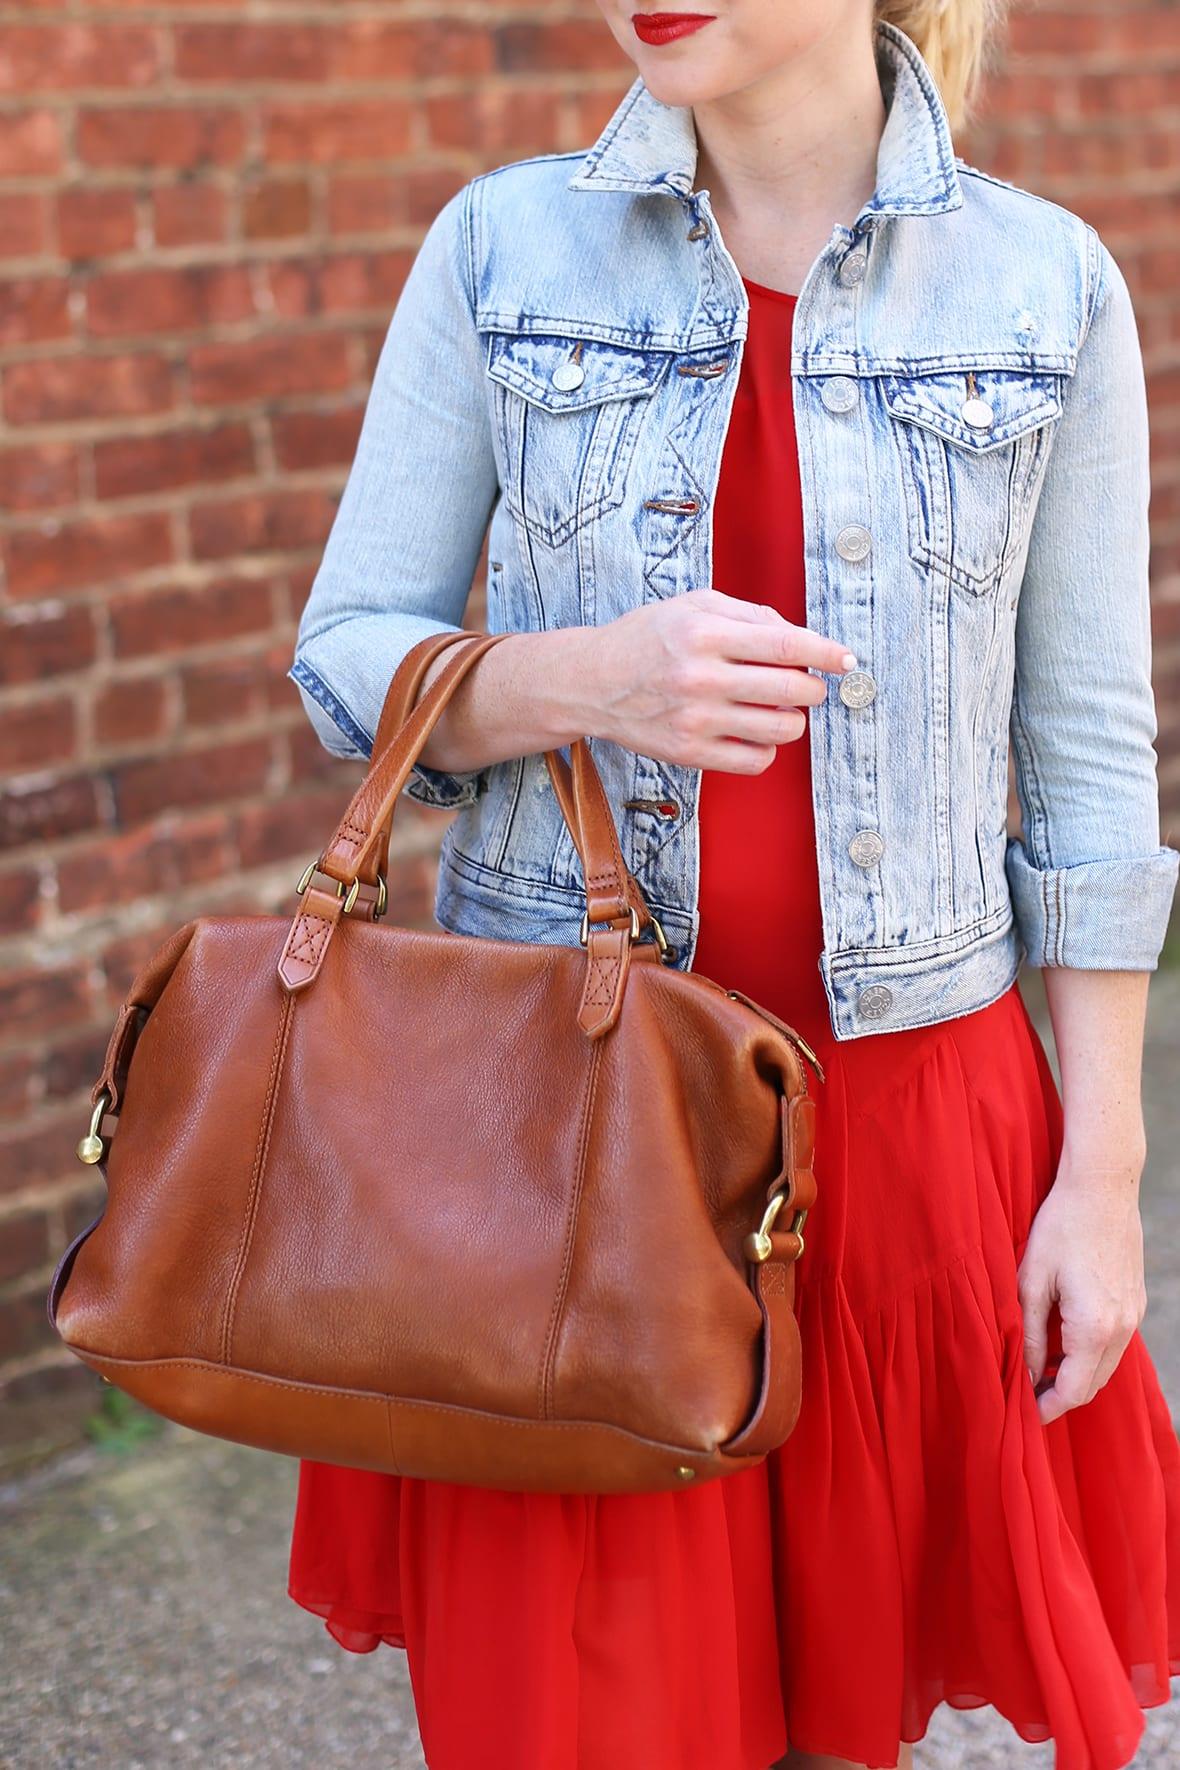 Red dress jean jacket back